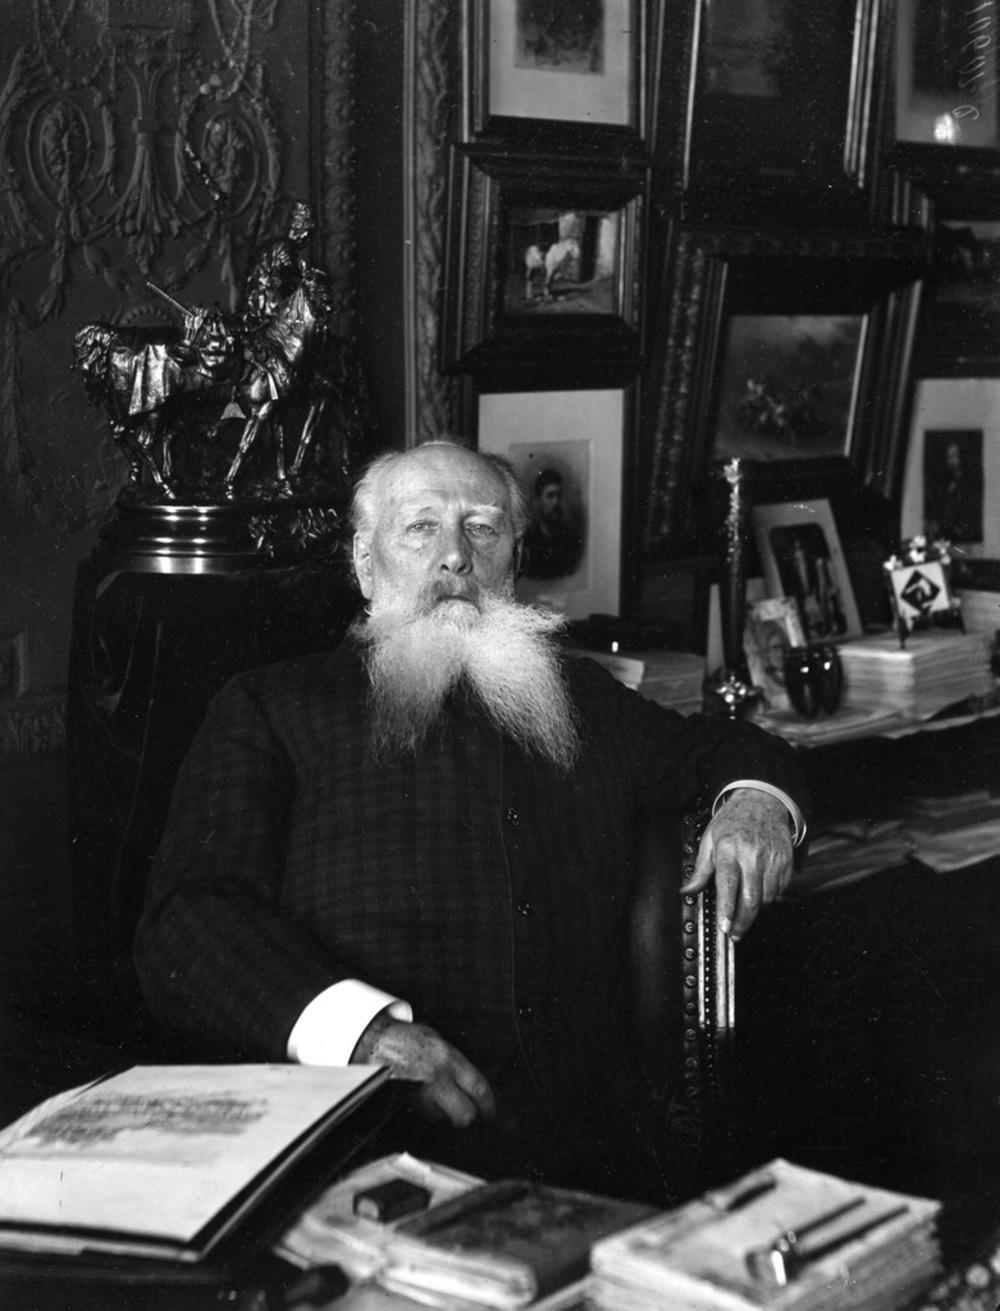 1908. Скульптор Александр Михайлович Опекушин